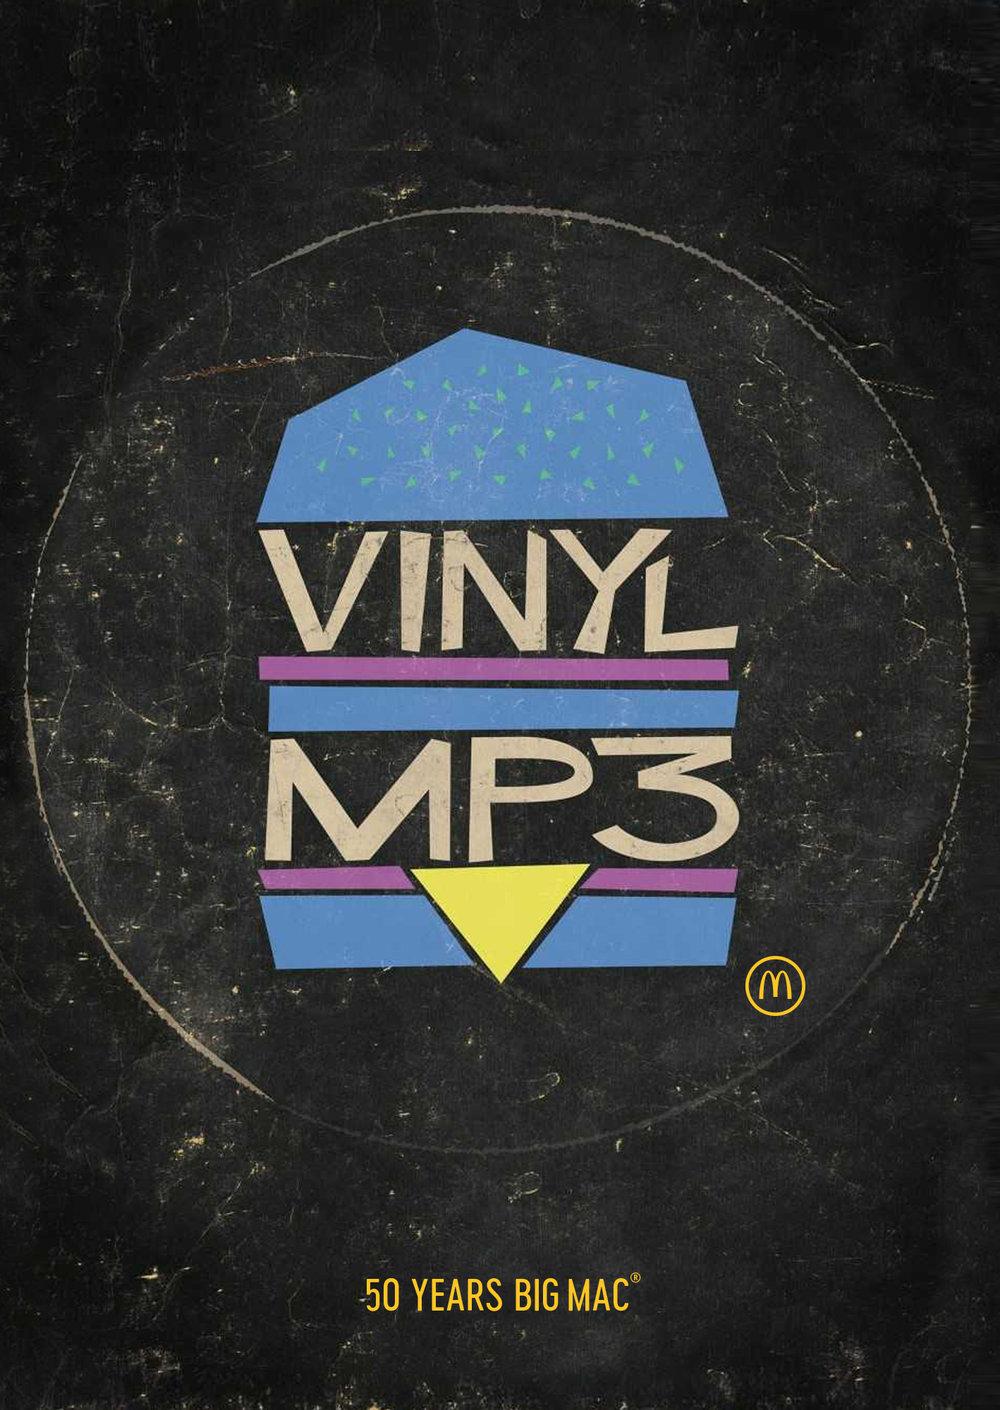 55_Vinyl:MP3.jpg